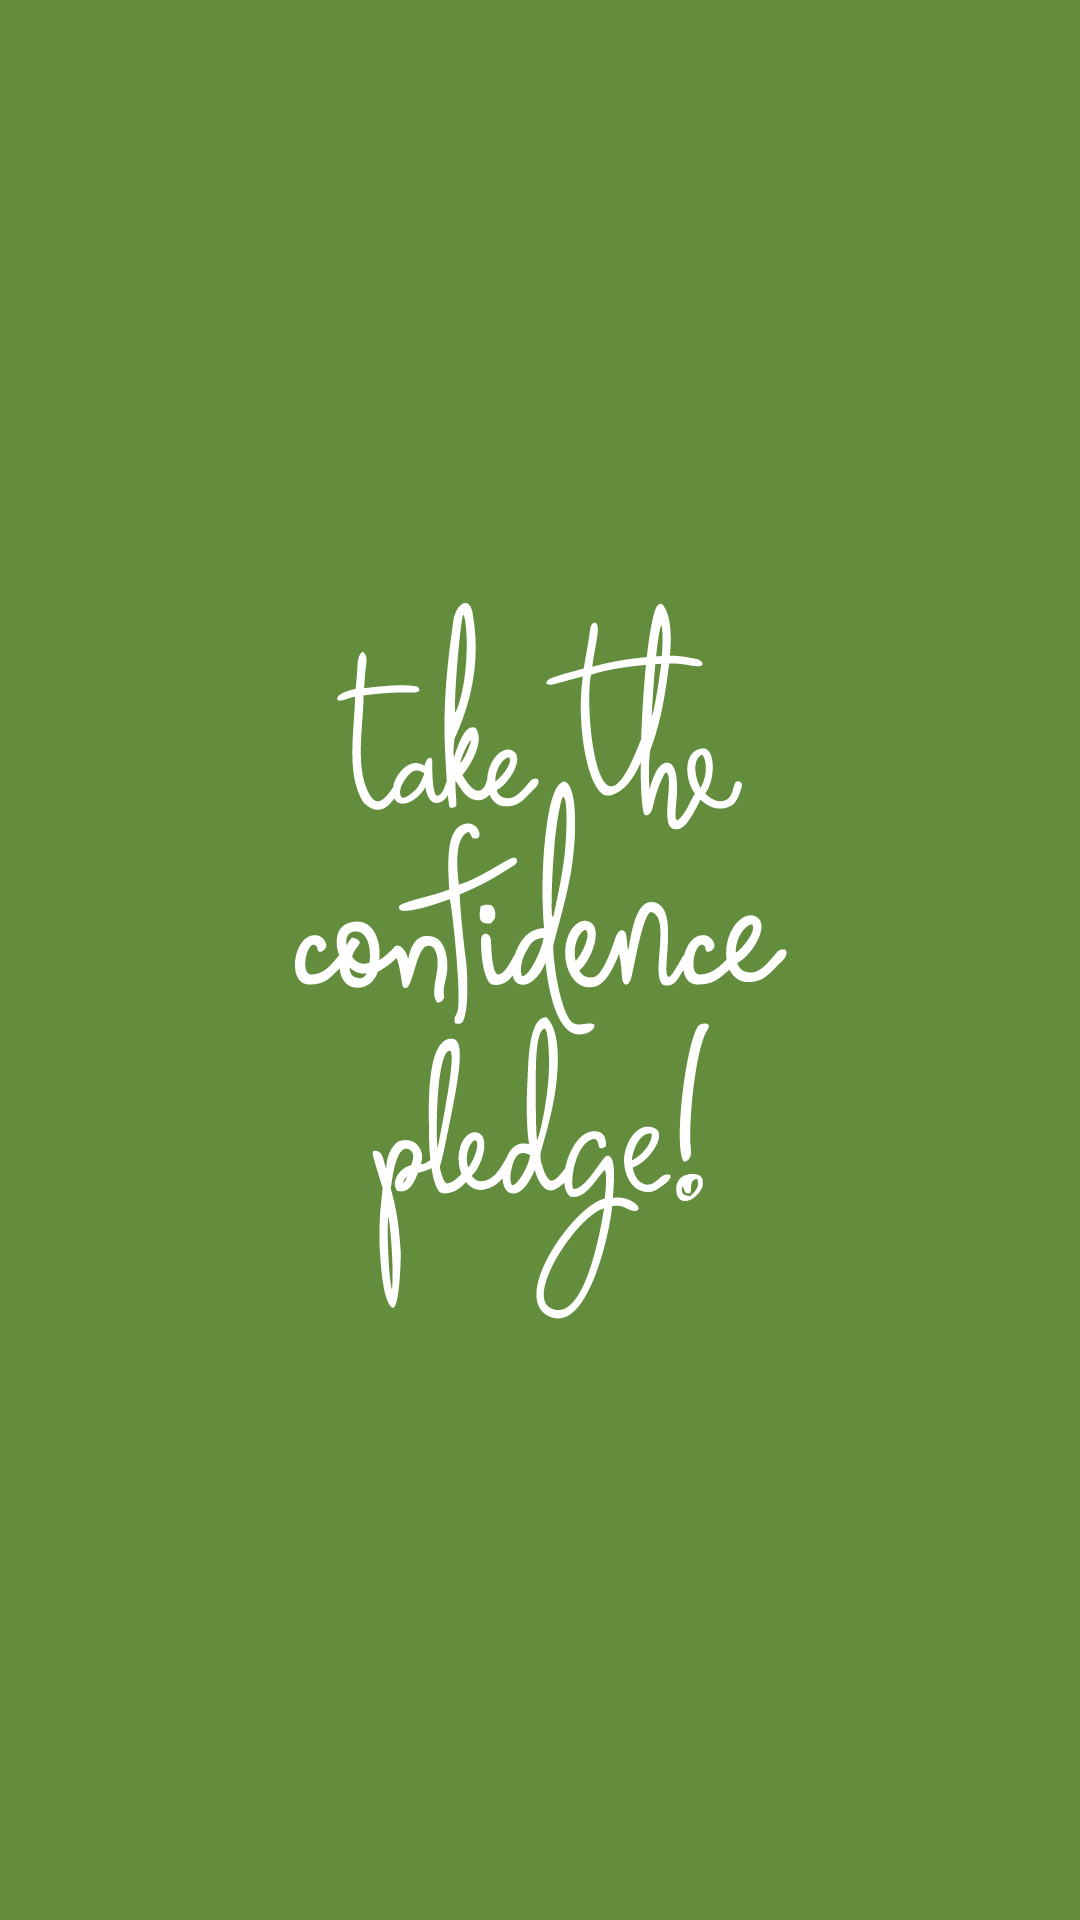 take the confidence pledge background green   Kappa Delta Kappa Delta 1080x1920